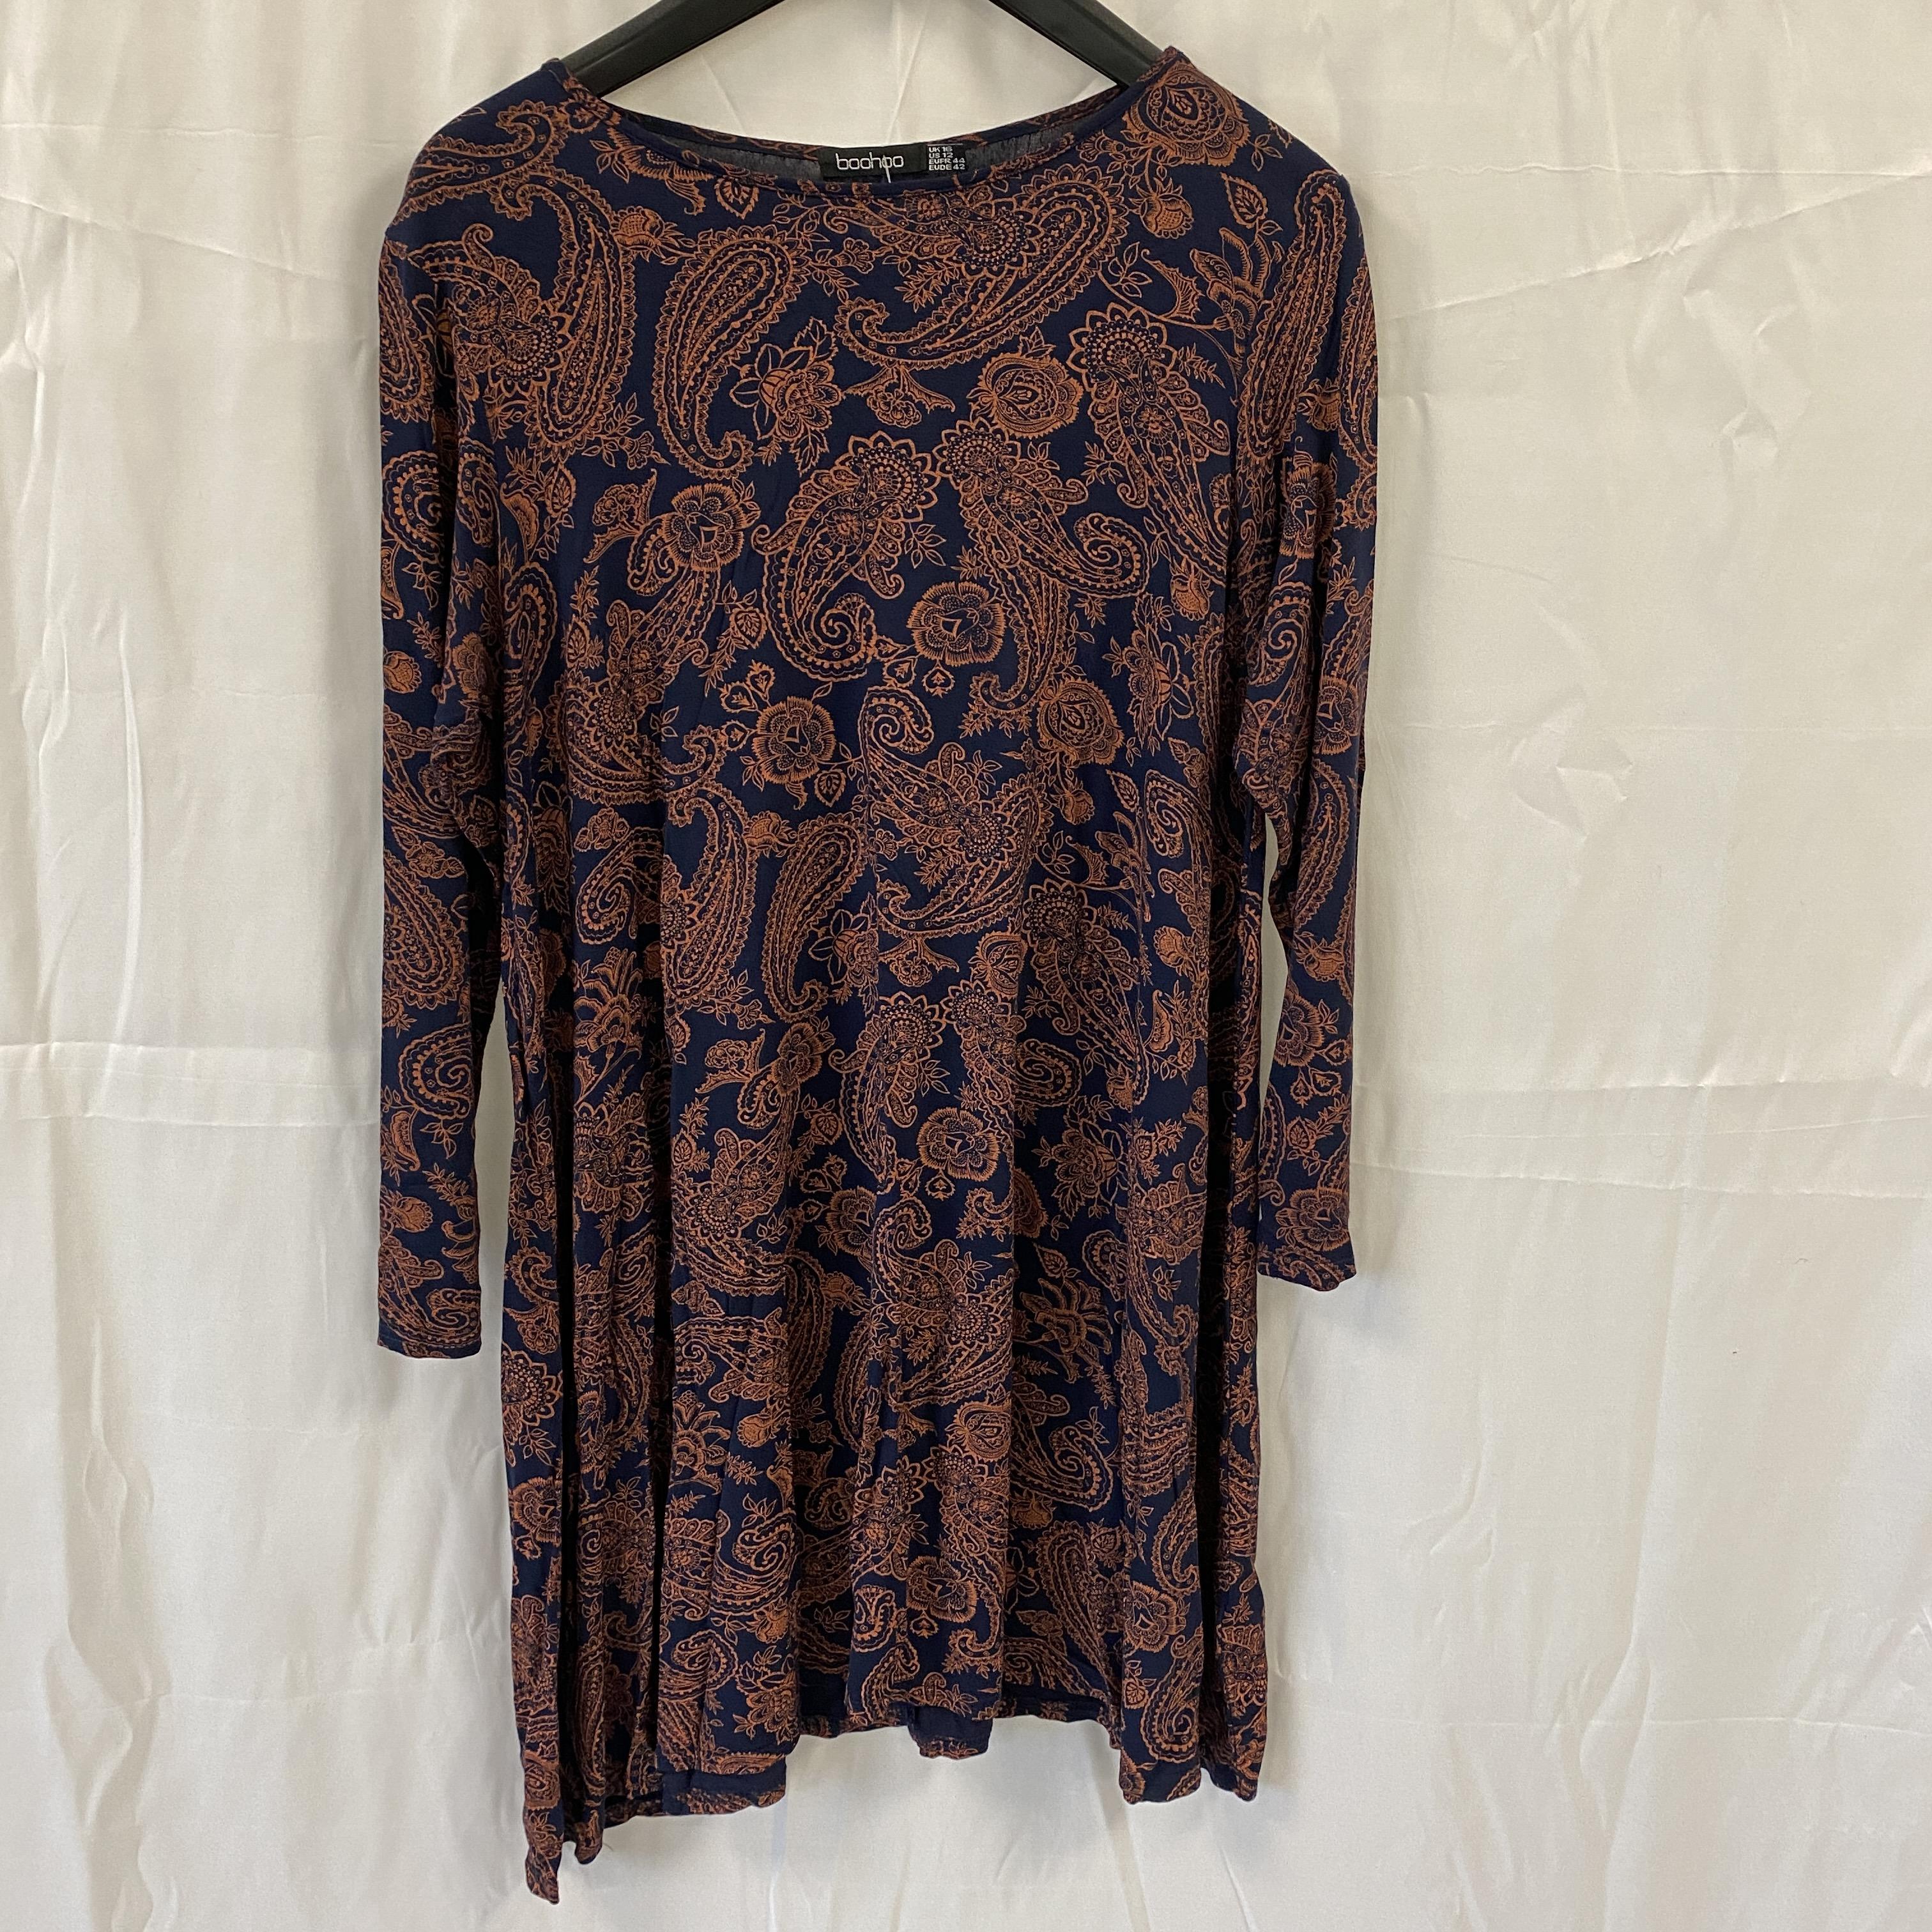 Boohoo Navy & Bronze Dress - Size 16